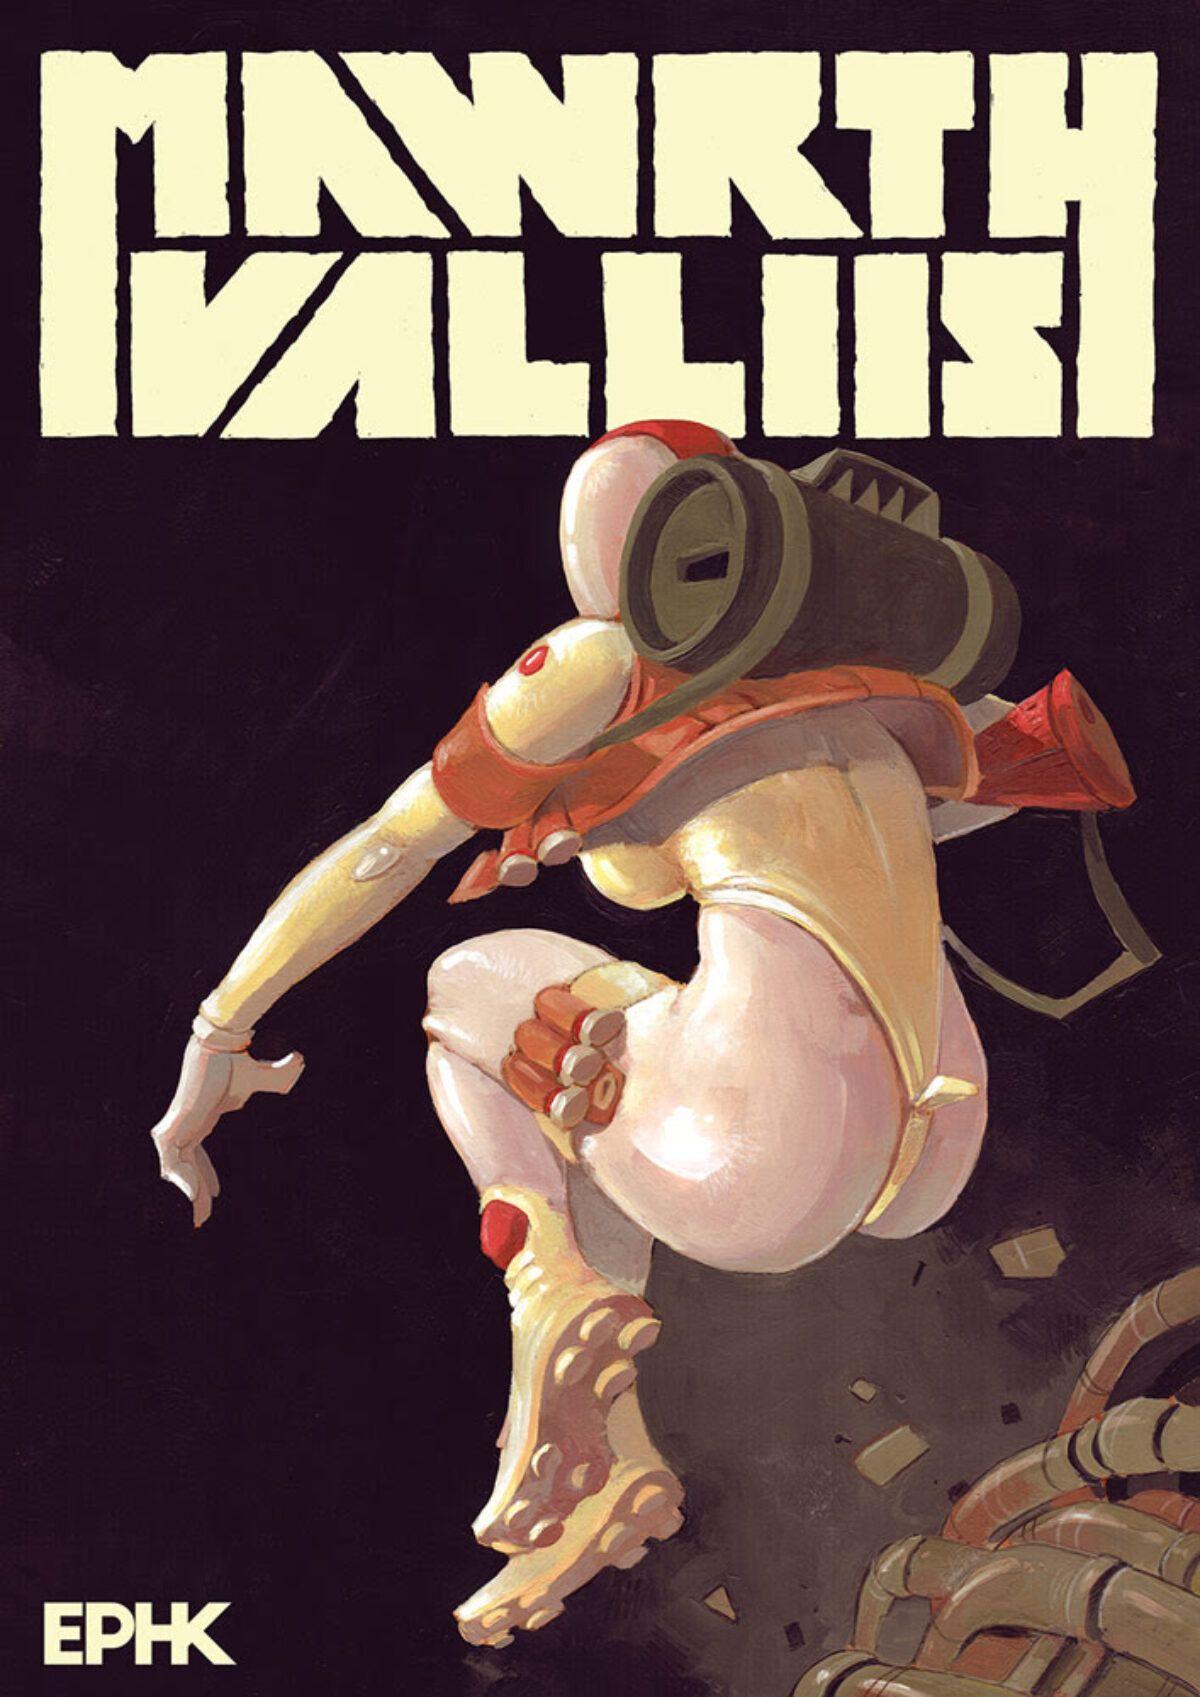 Mawrth Valliis Is a Beautiful & Inventive Martian Odyssey | CBR